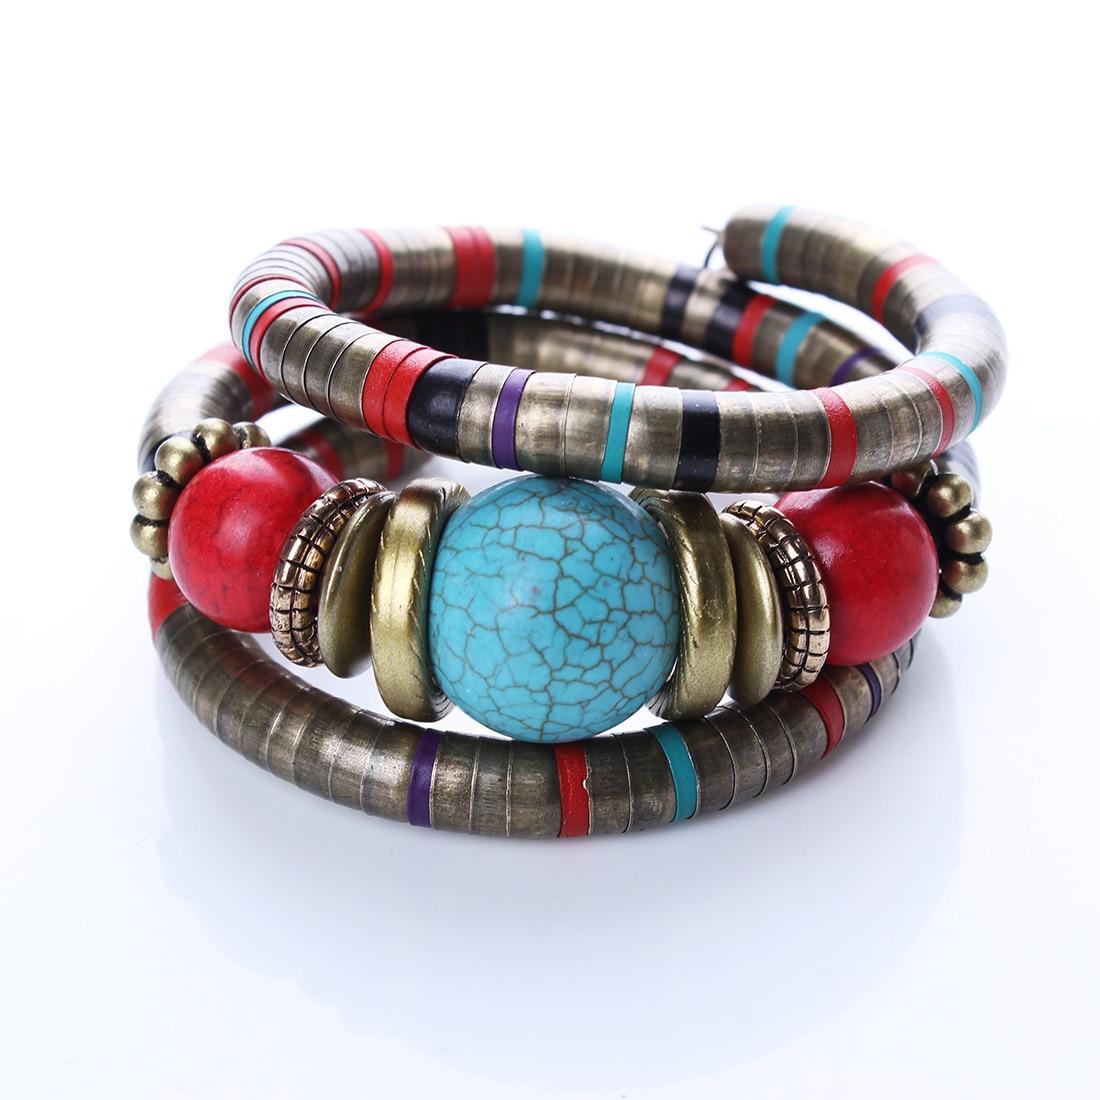 Boho Punk Blue Natural Stone Bead Bohemian Bangle Bracelet For Women Buddha Snake Bone Tibetan Vintage Jewelry